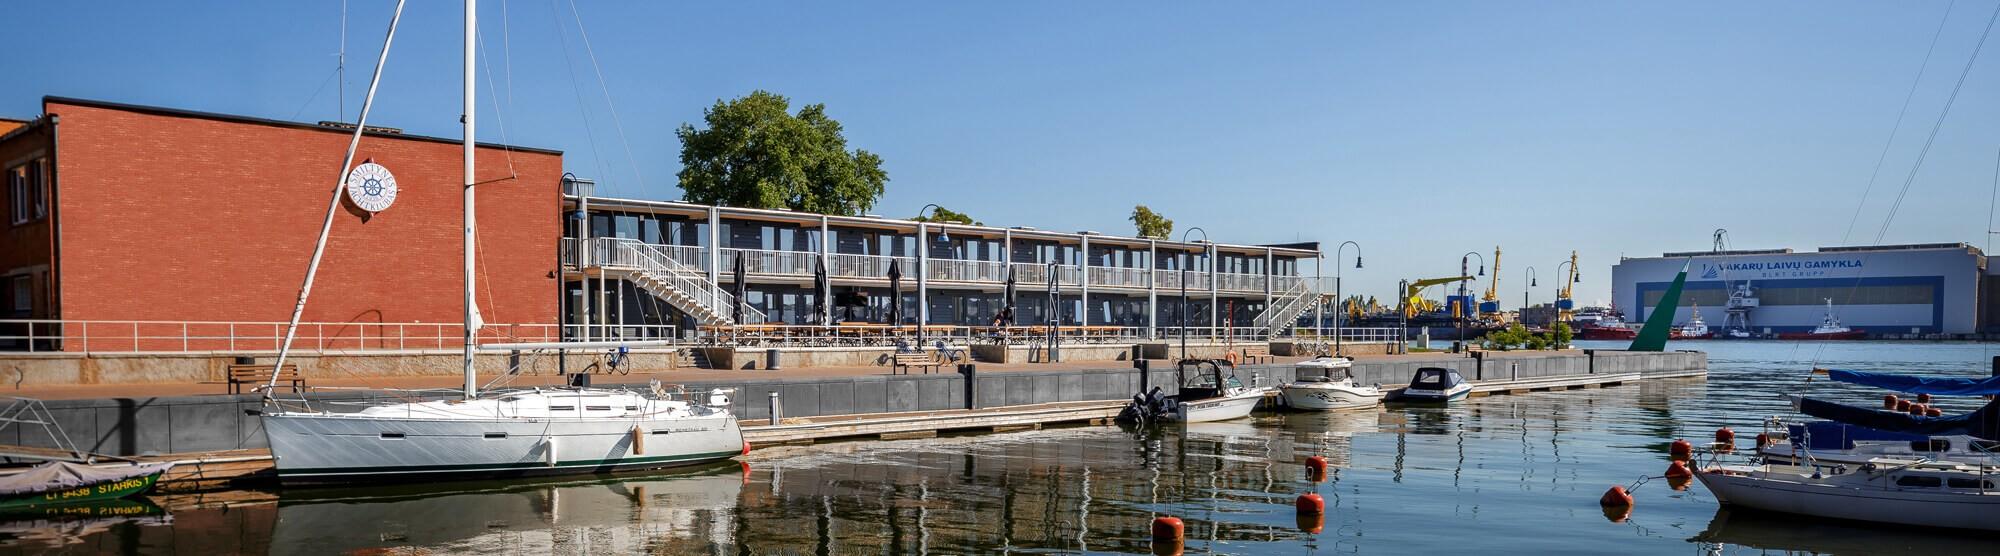 Smiltyne Yachtclub hotel